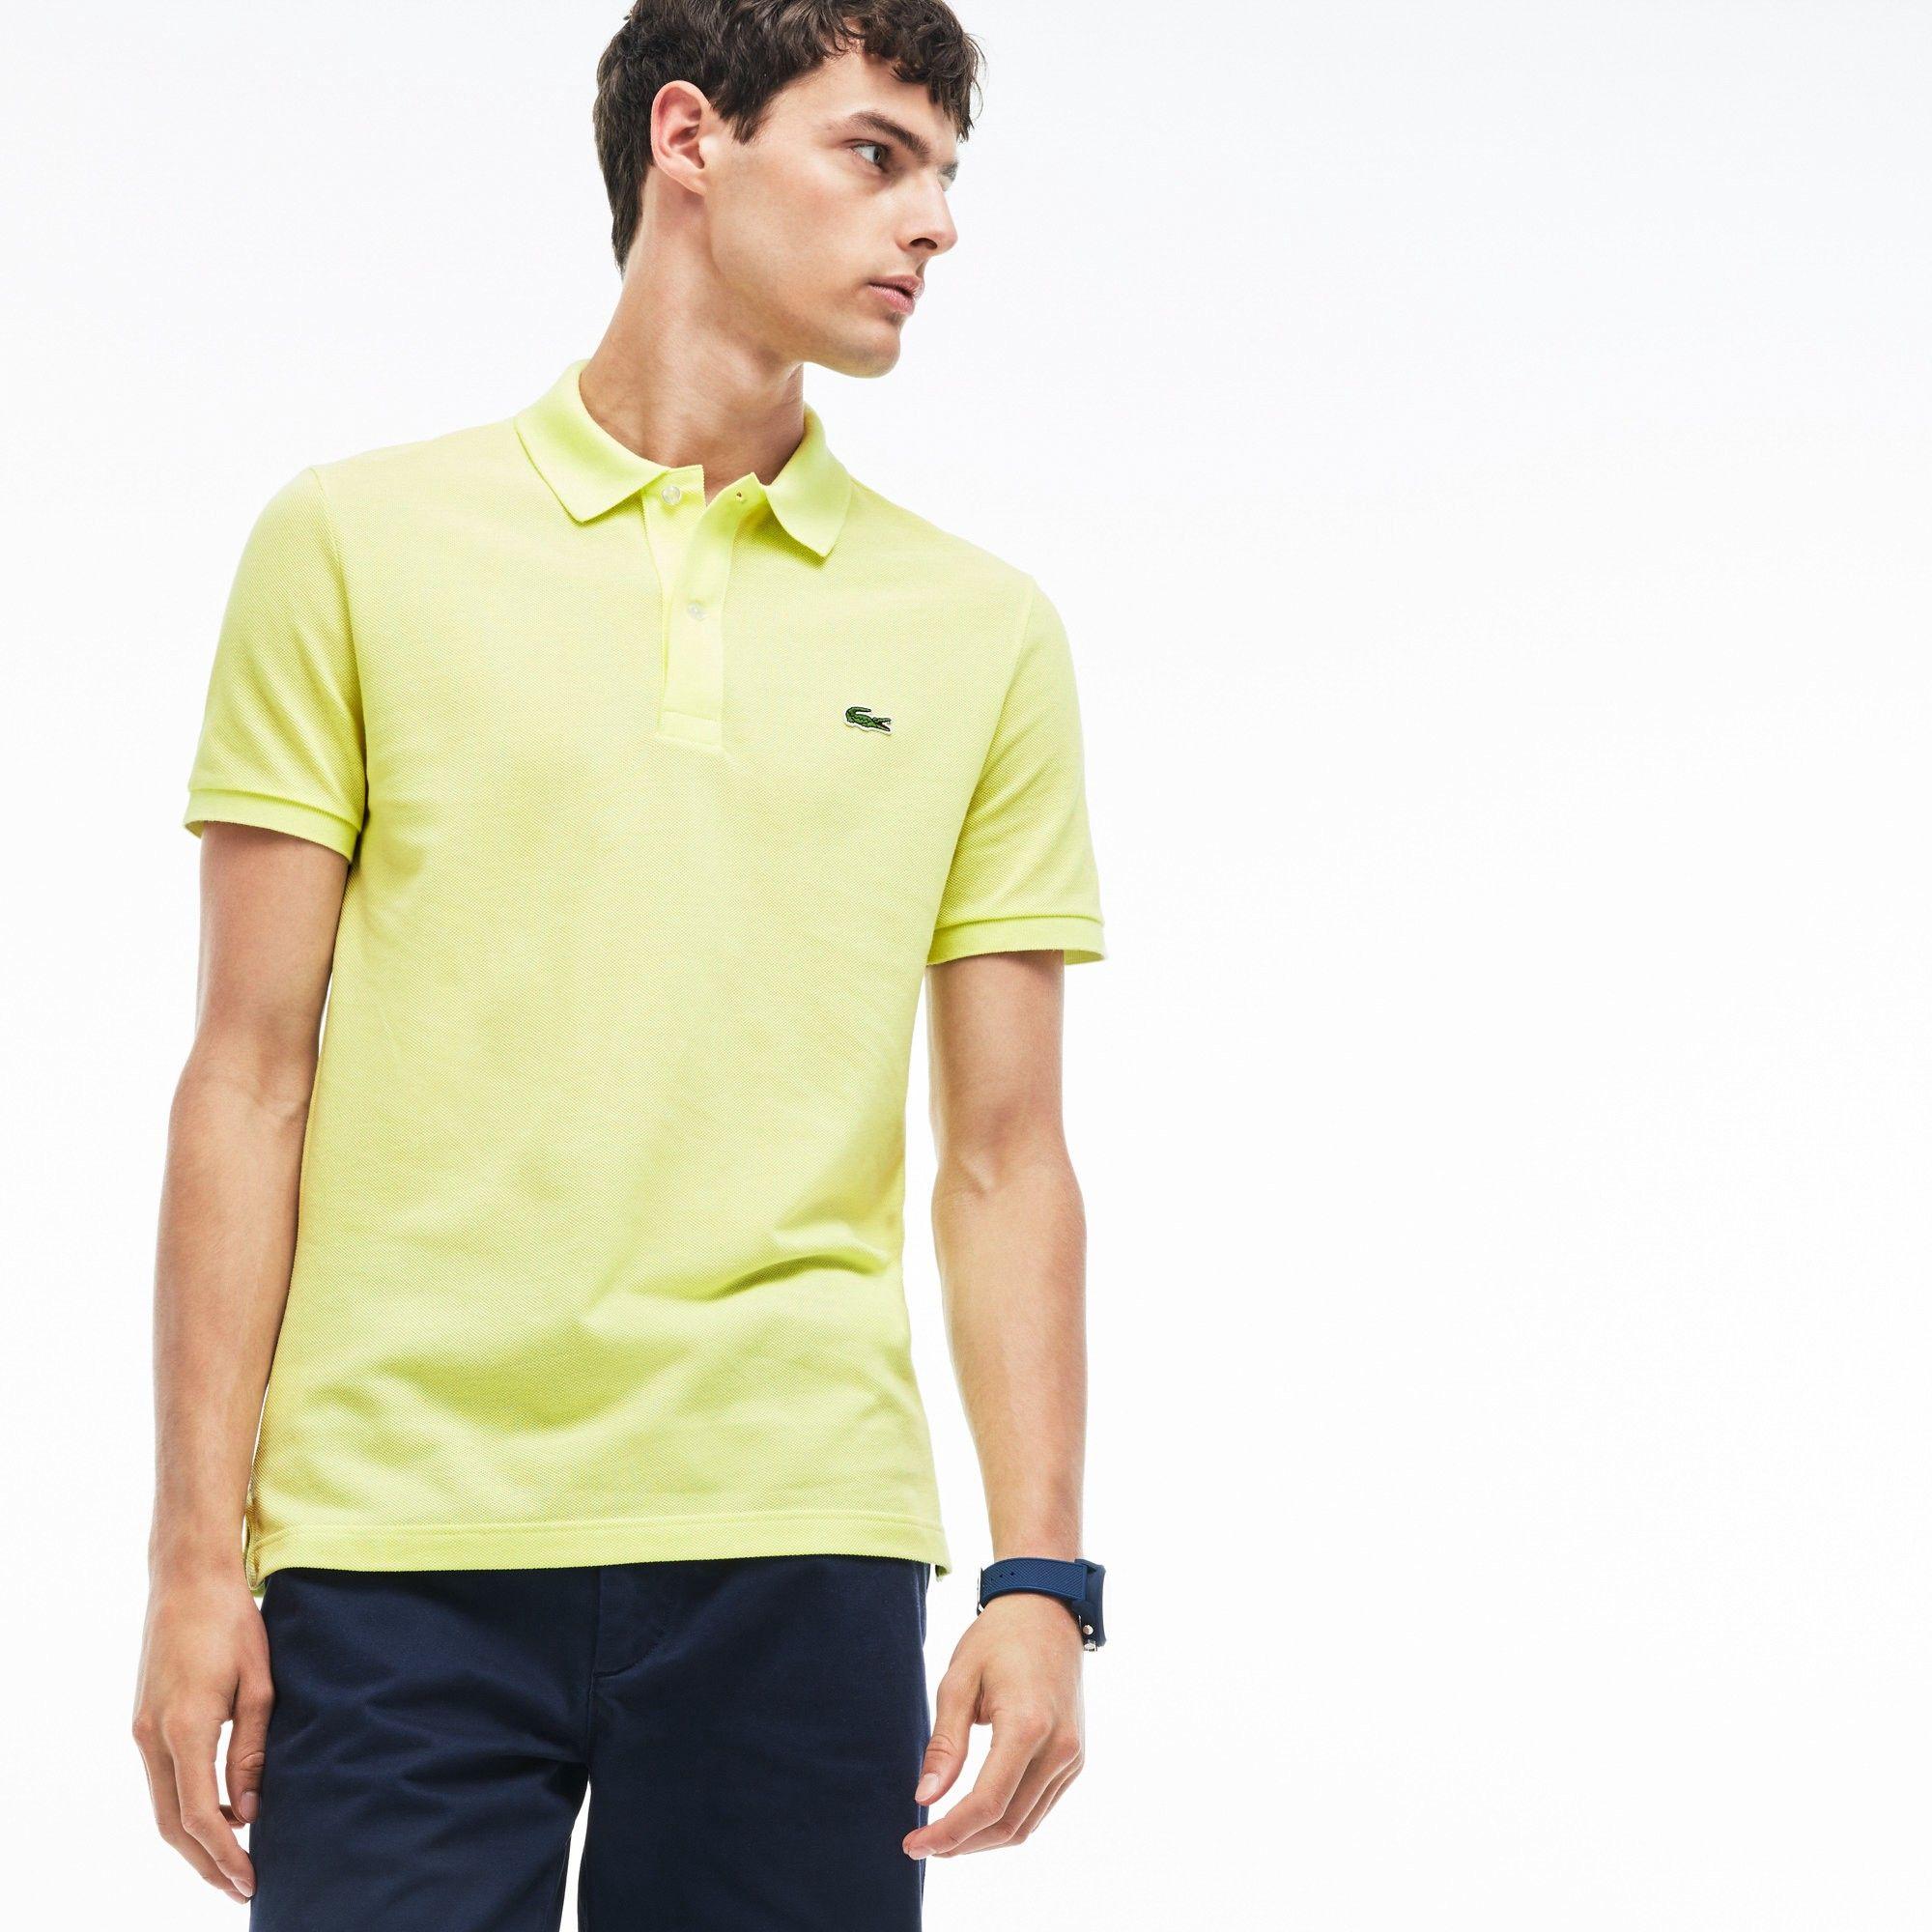 570abf5ec7fc Lacoste Mens Slim Fit Polo Shirt - Nils Stucki Kieferorthopäde